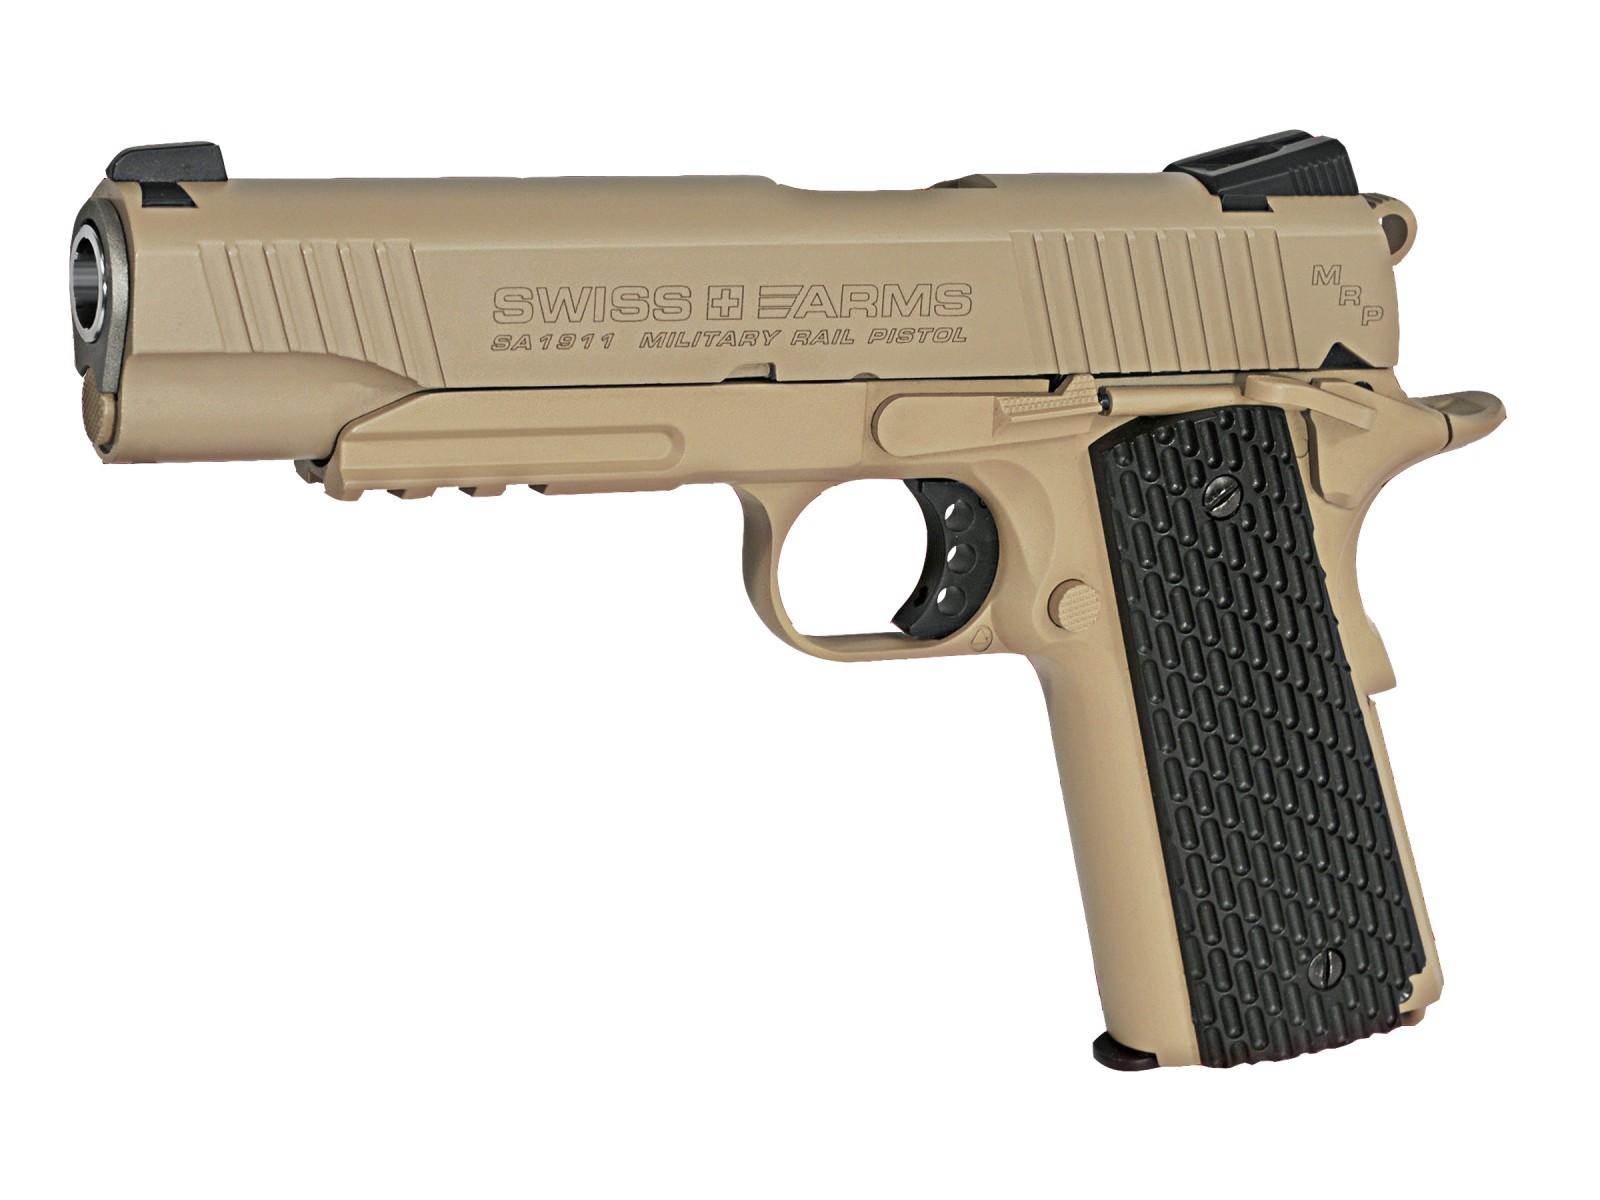 Swiss Arms SA 1911 MRP CO2 BB Pistol, Black Grips